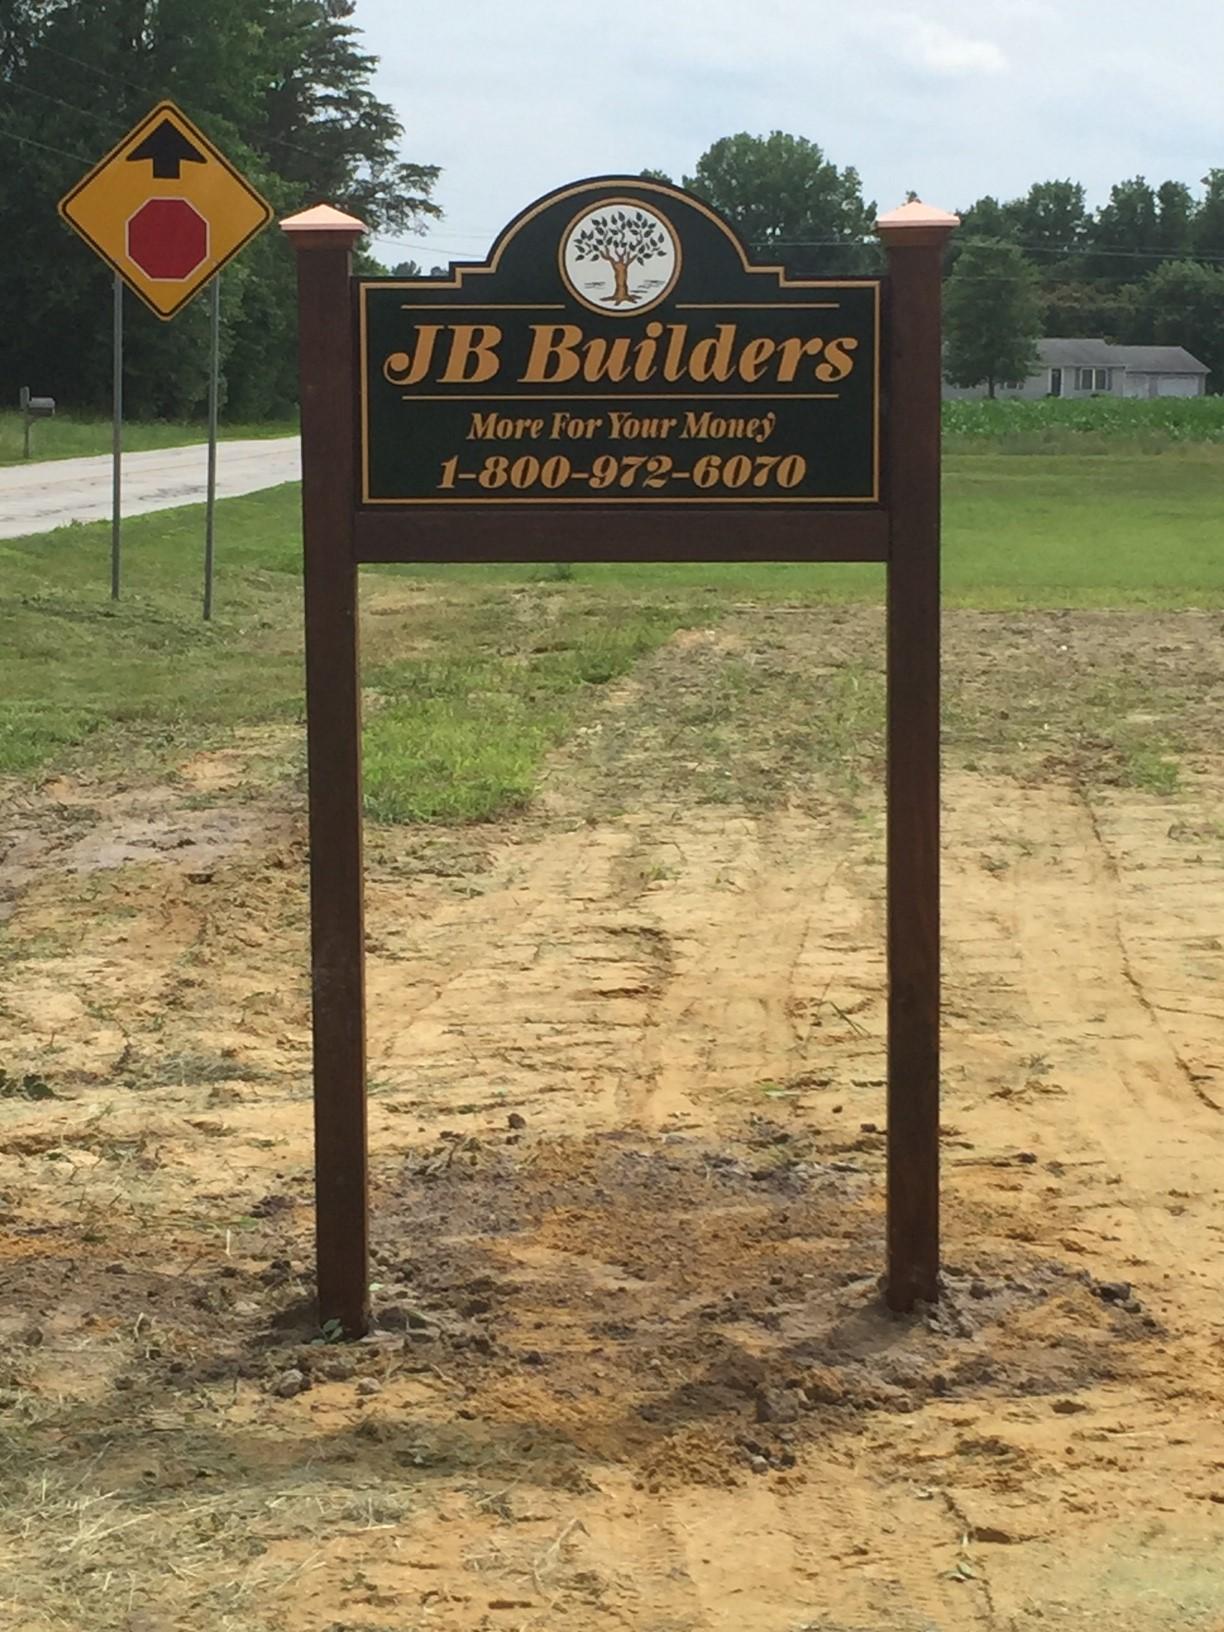 JB Builders